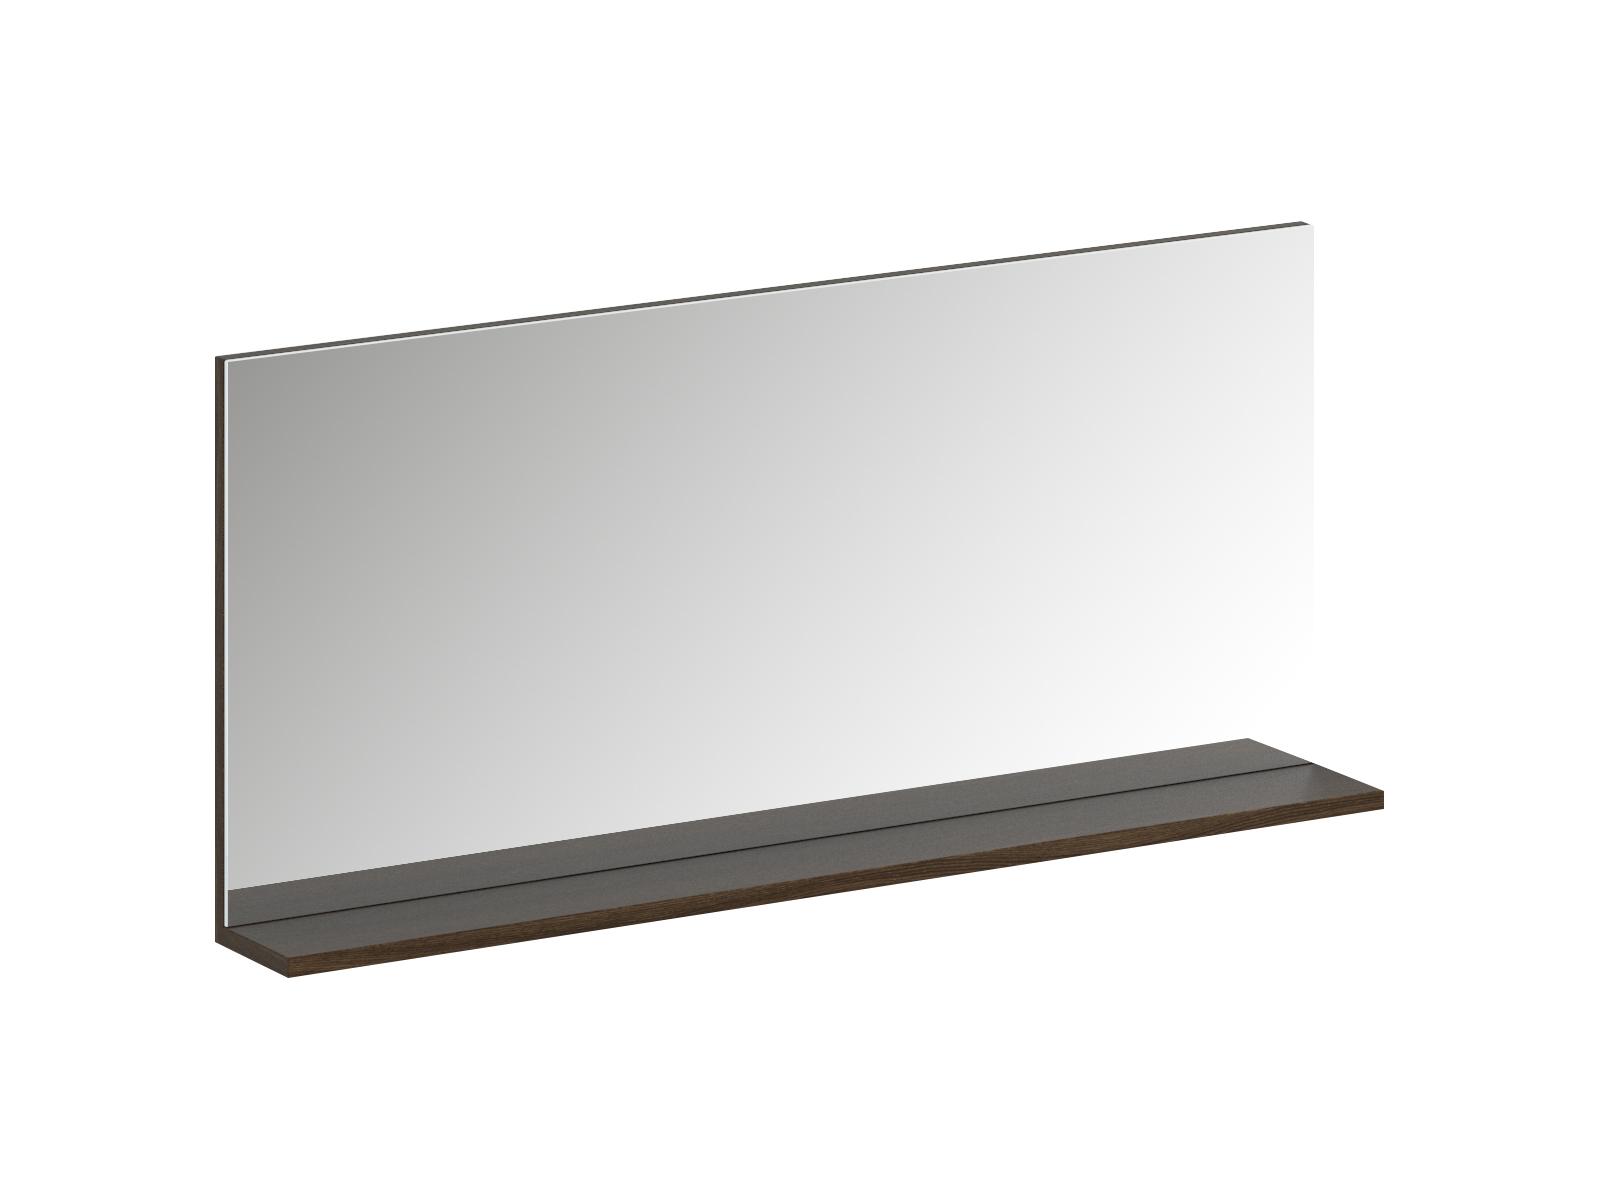 Зеркало UnoЗеркала<br>Зеркало настенное с полкой.<br>